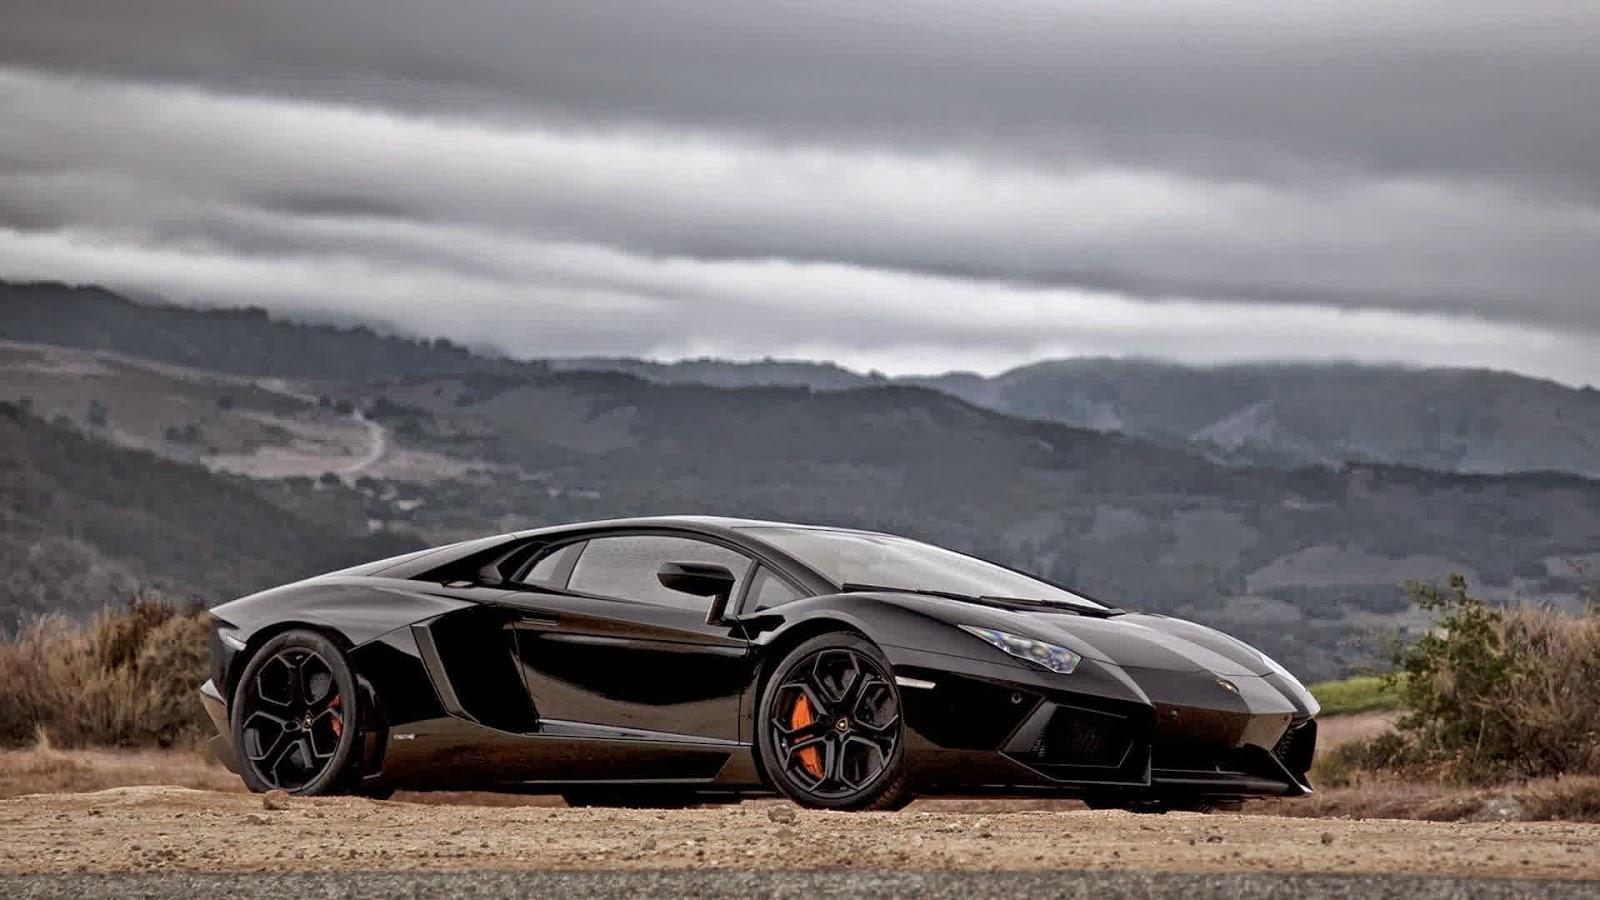 Get 3 Black Lamborghini Aventador Wallpapers On the Mountain